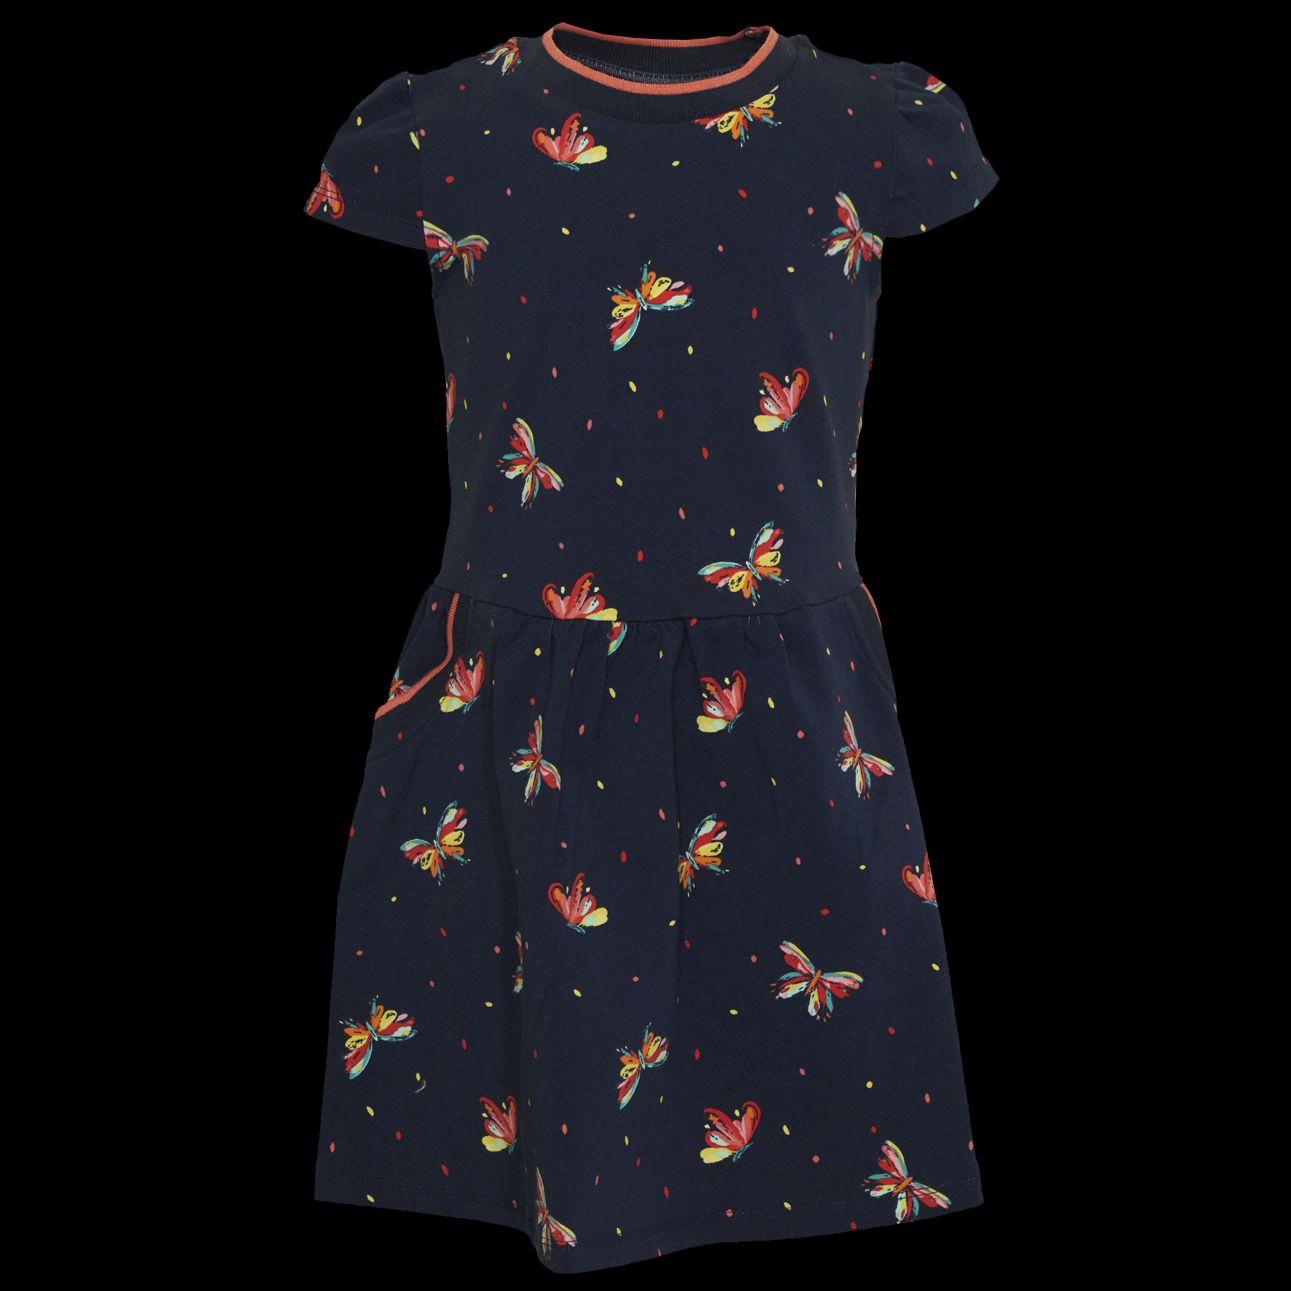 Kleid Schmetterling 92 Blau SOMEONE 100% Awesome